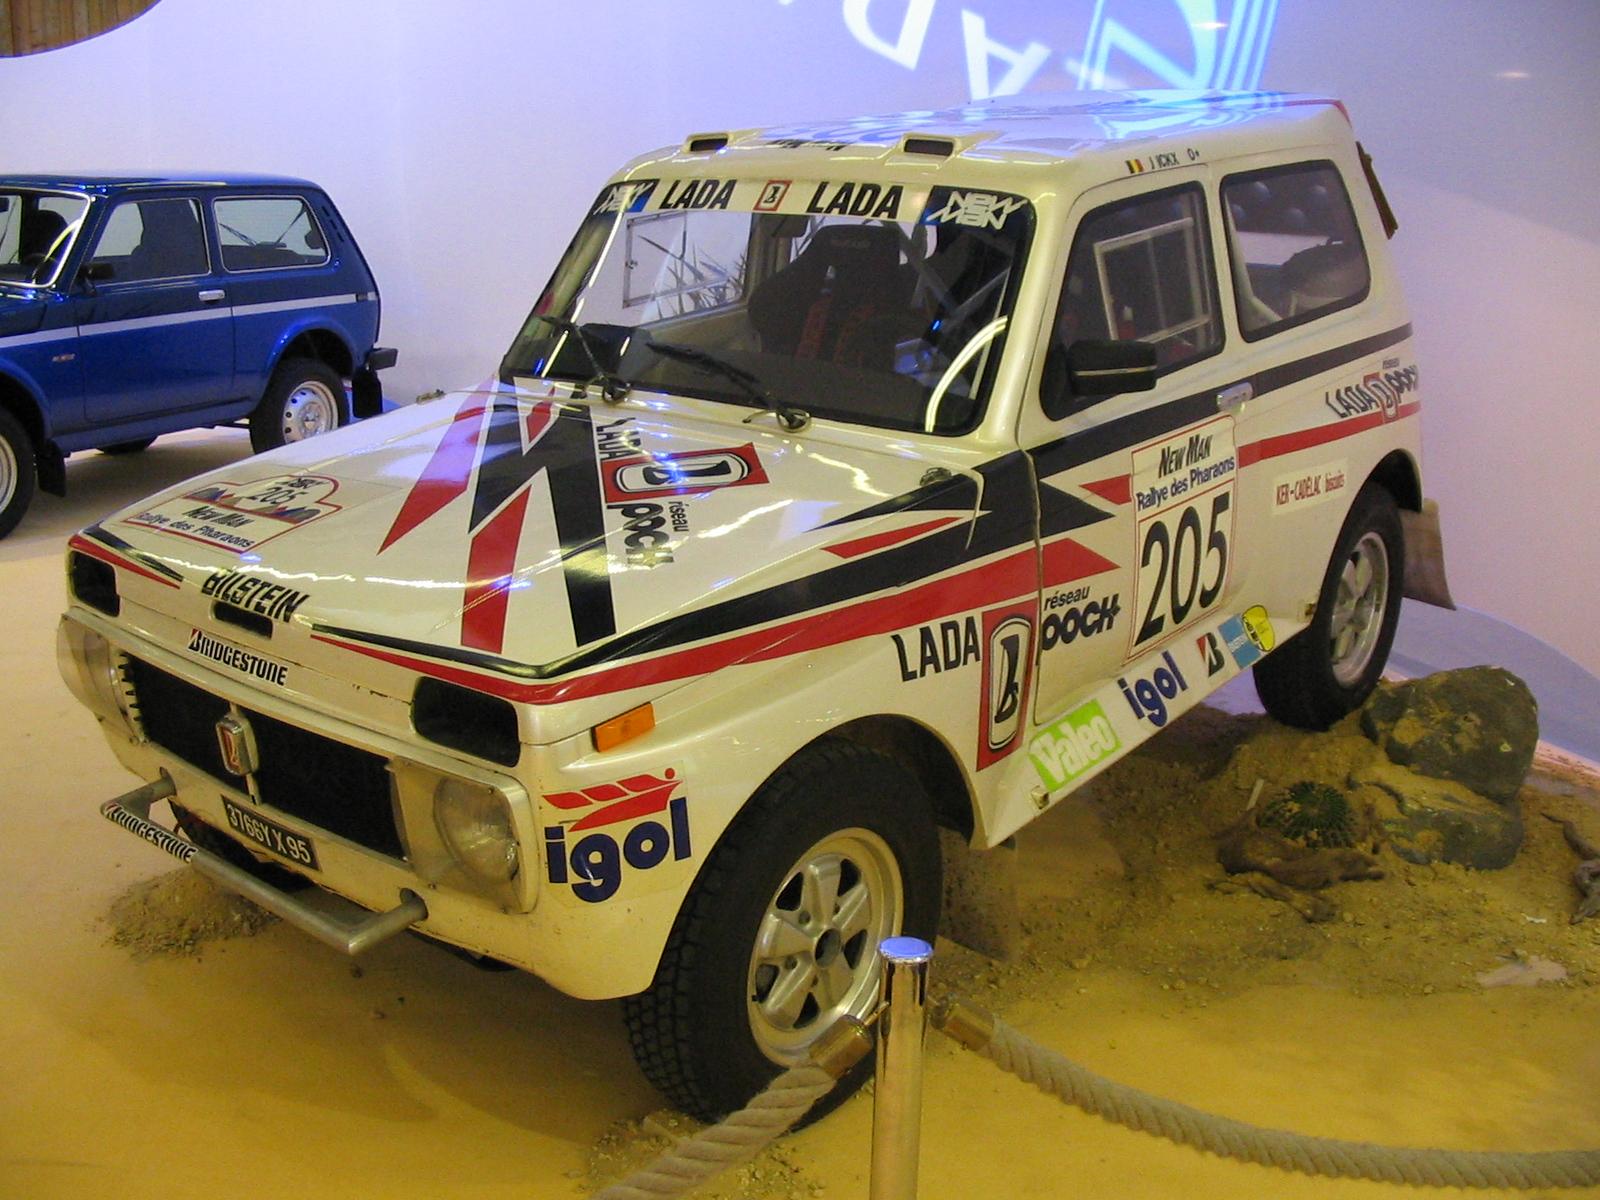 2004 Lada Niva rally_3q_front